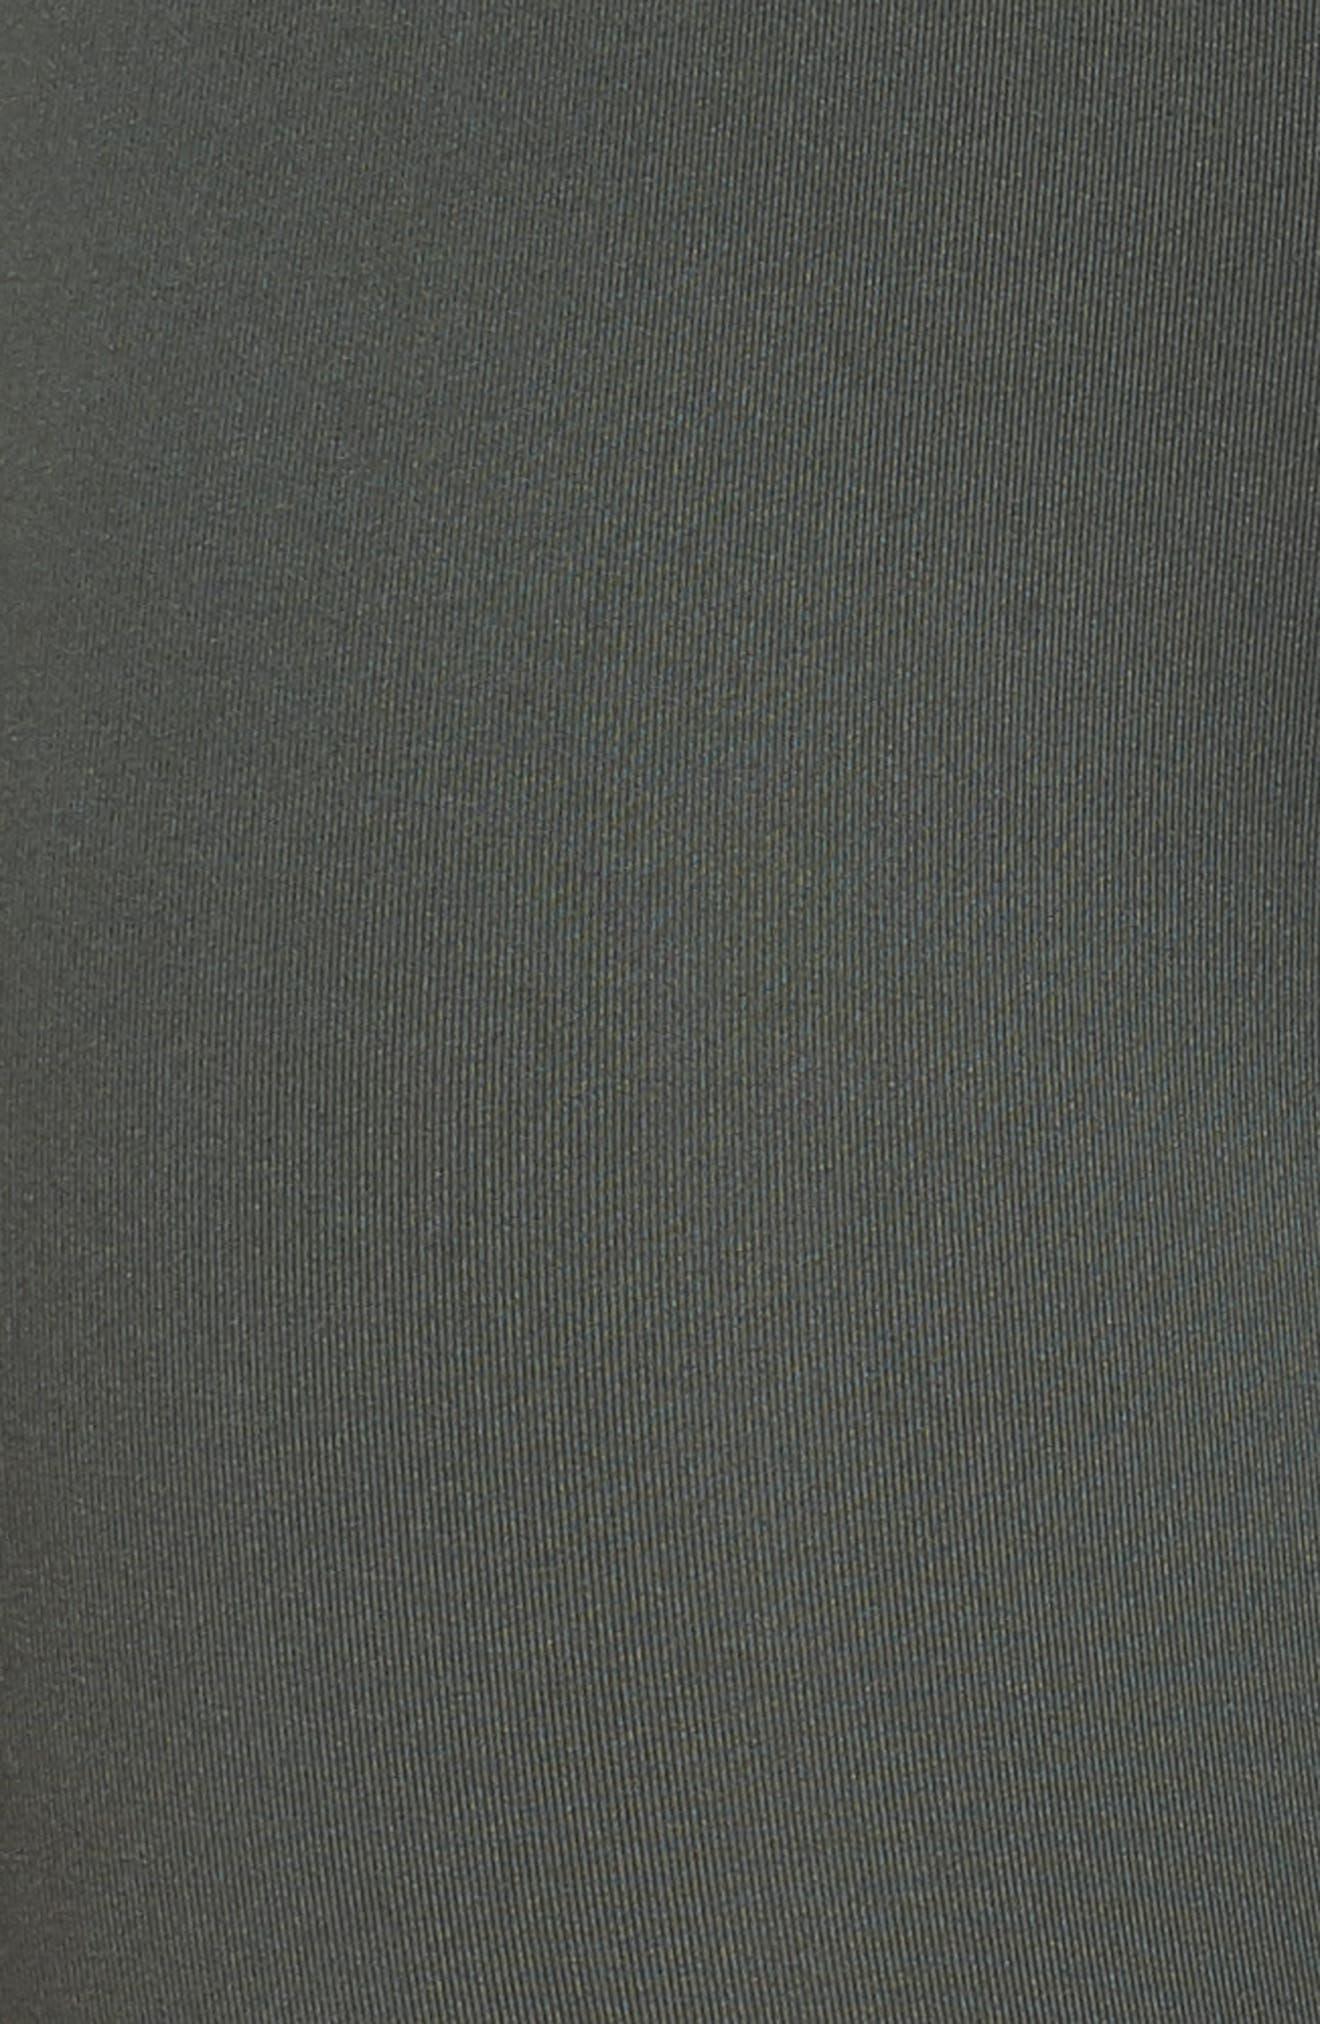 High Waist Crop Leggings,                             Alternate thumbnail 6, color,                             Grey Urban